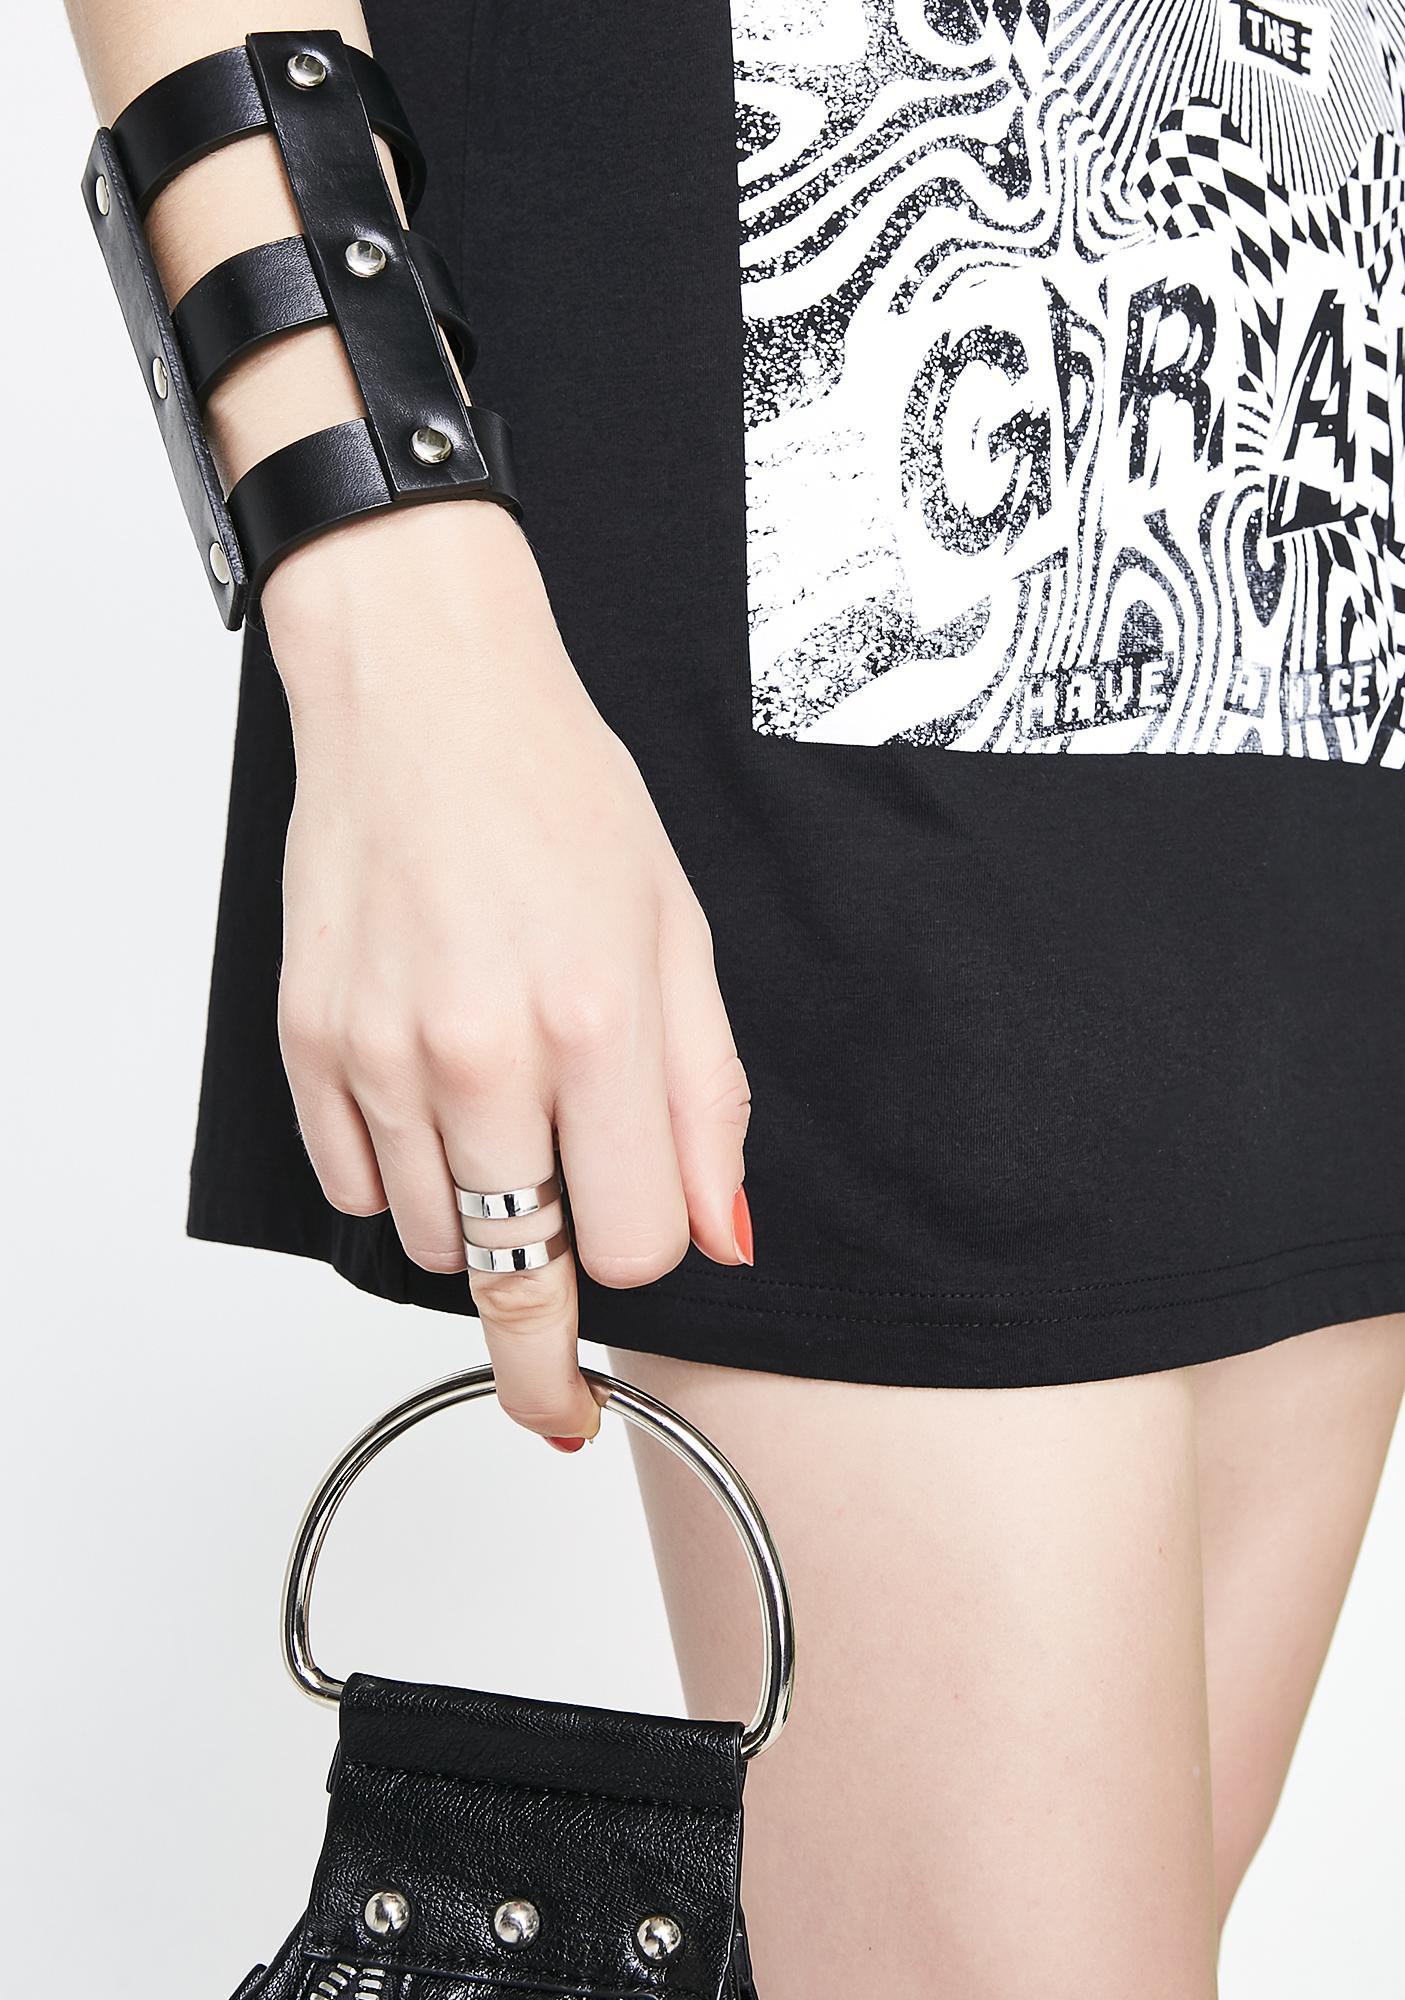 Killa Queen Caged Armband